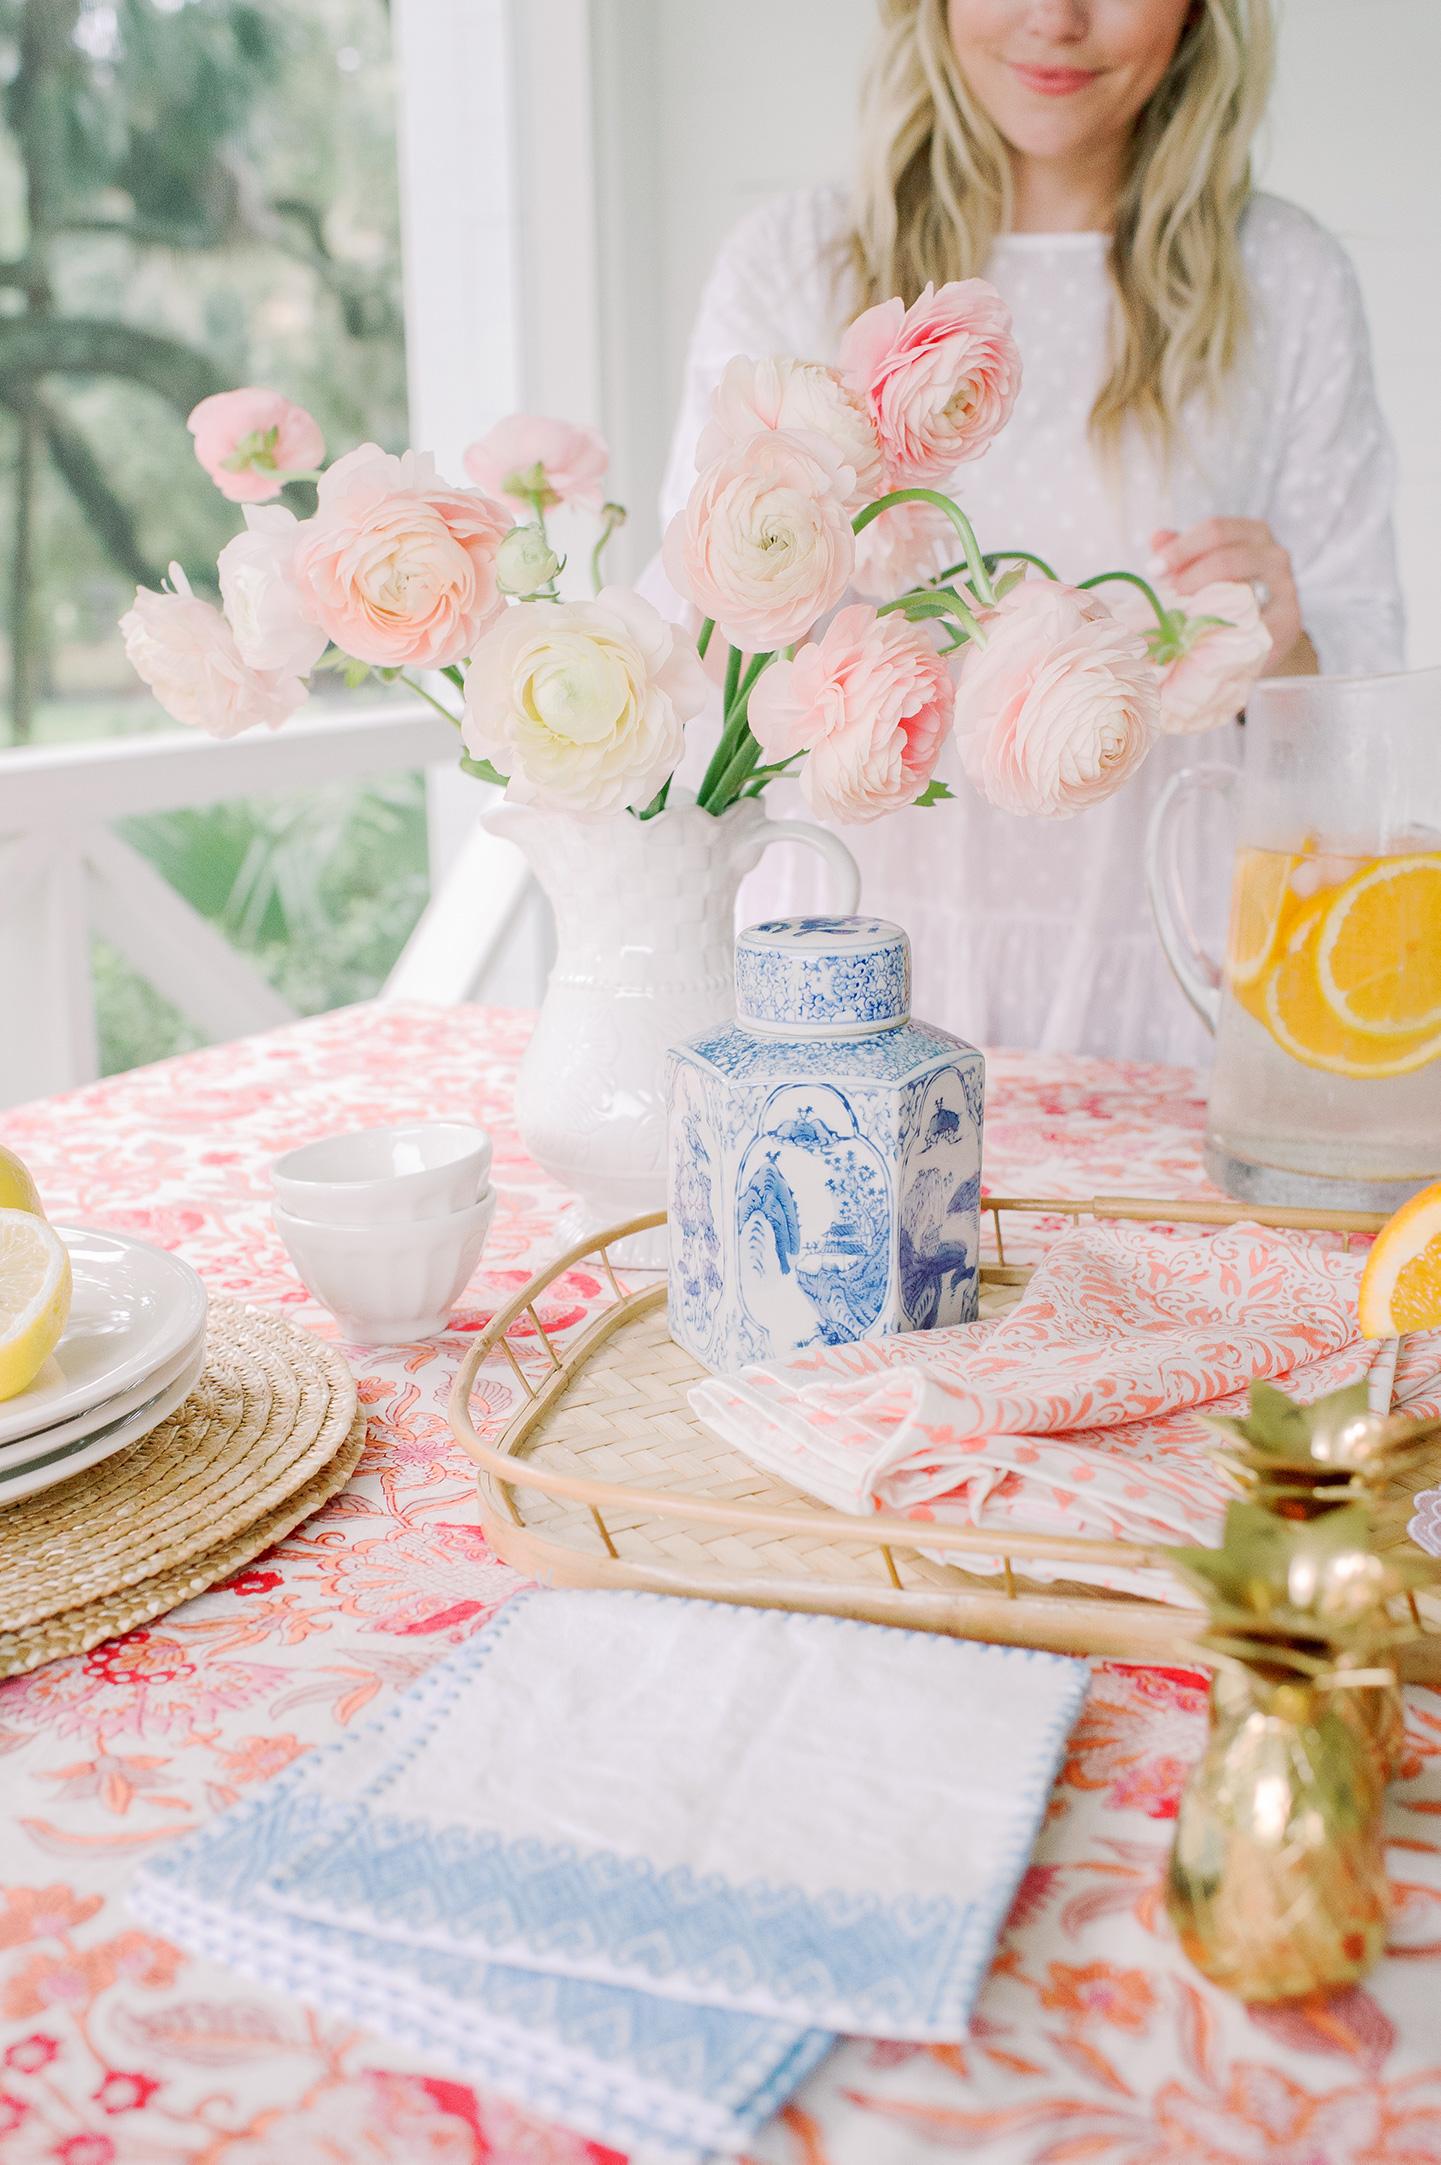 Tabletop Brands for Grandmillennial